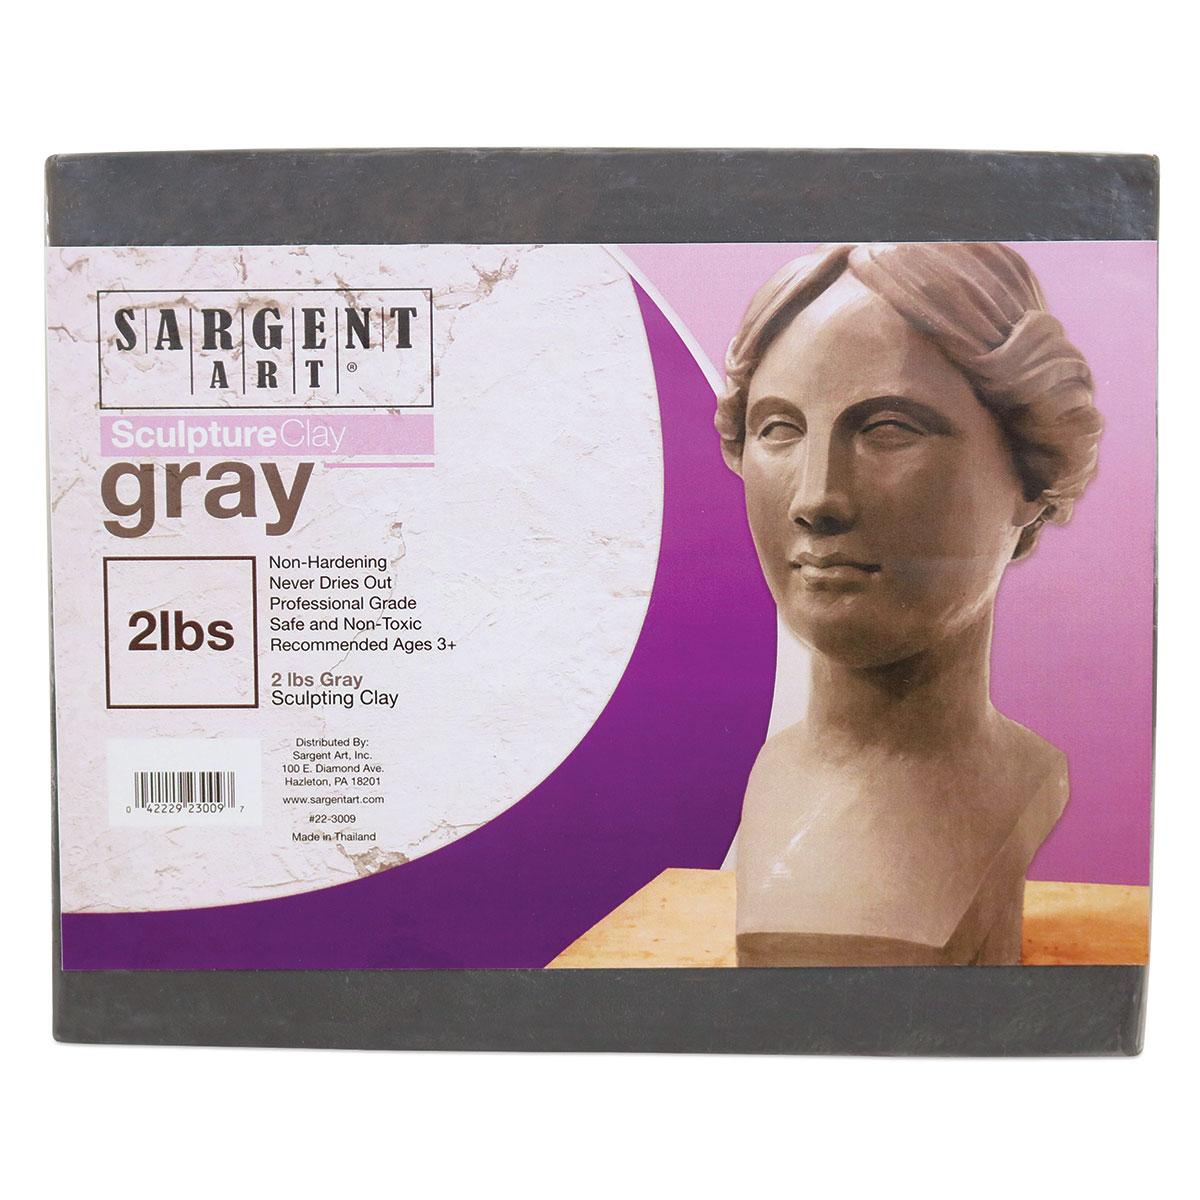 Sargent Art Professional Sculpture Clay